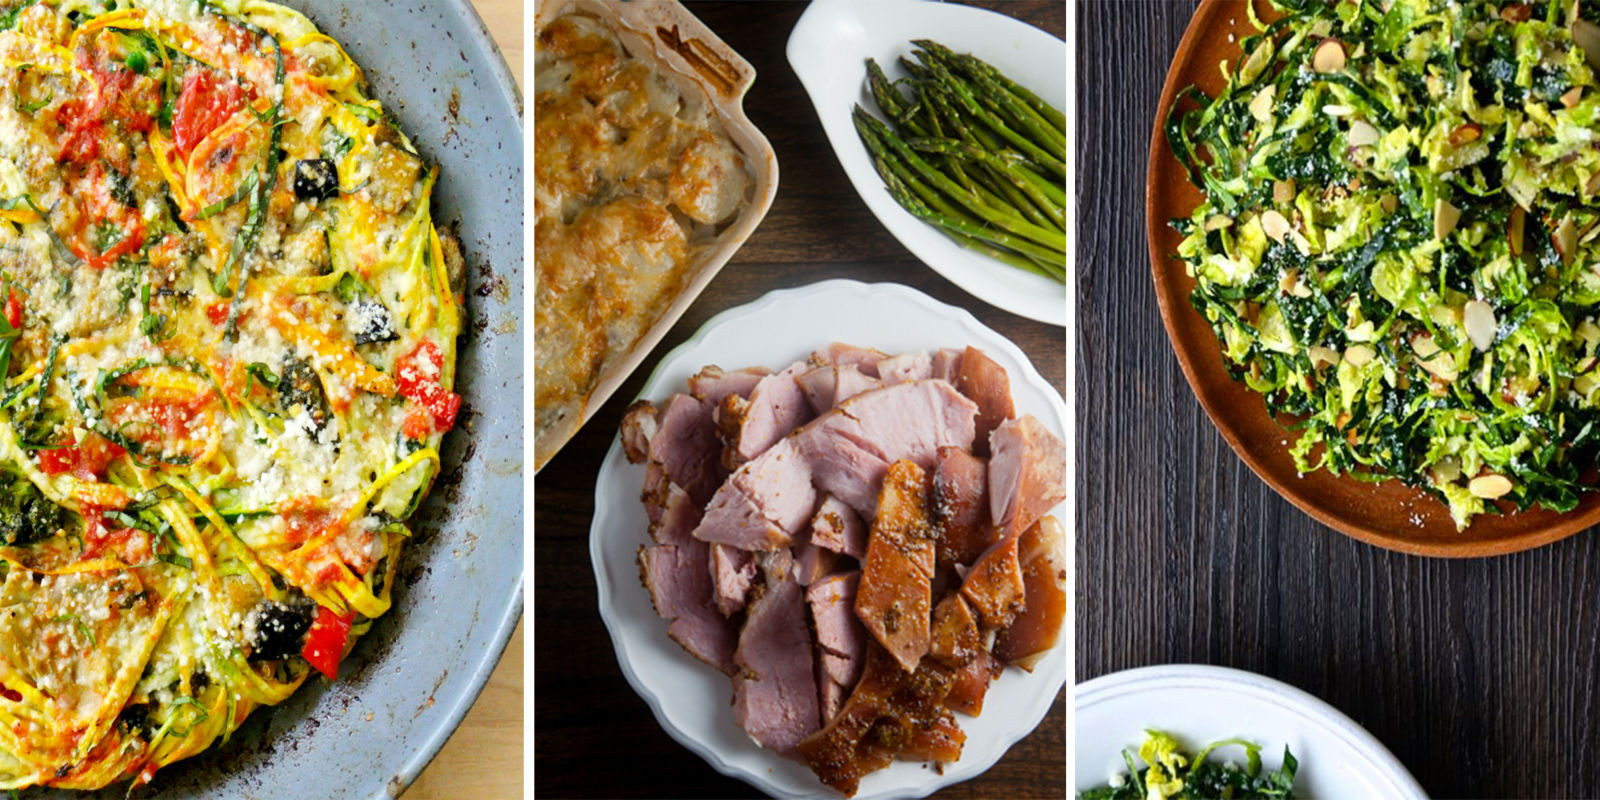 Healthy Easter Dinner  Healthy Easter Dinner Recipes Easter Dinner Menu Ideas